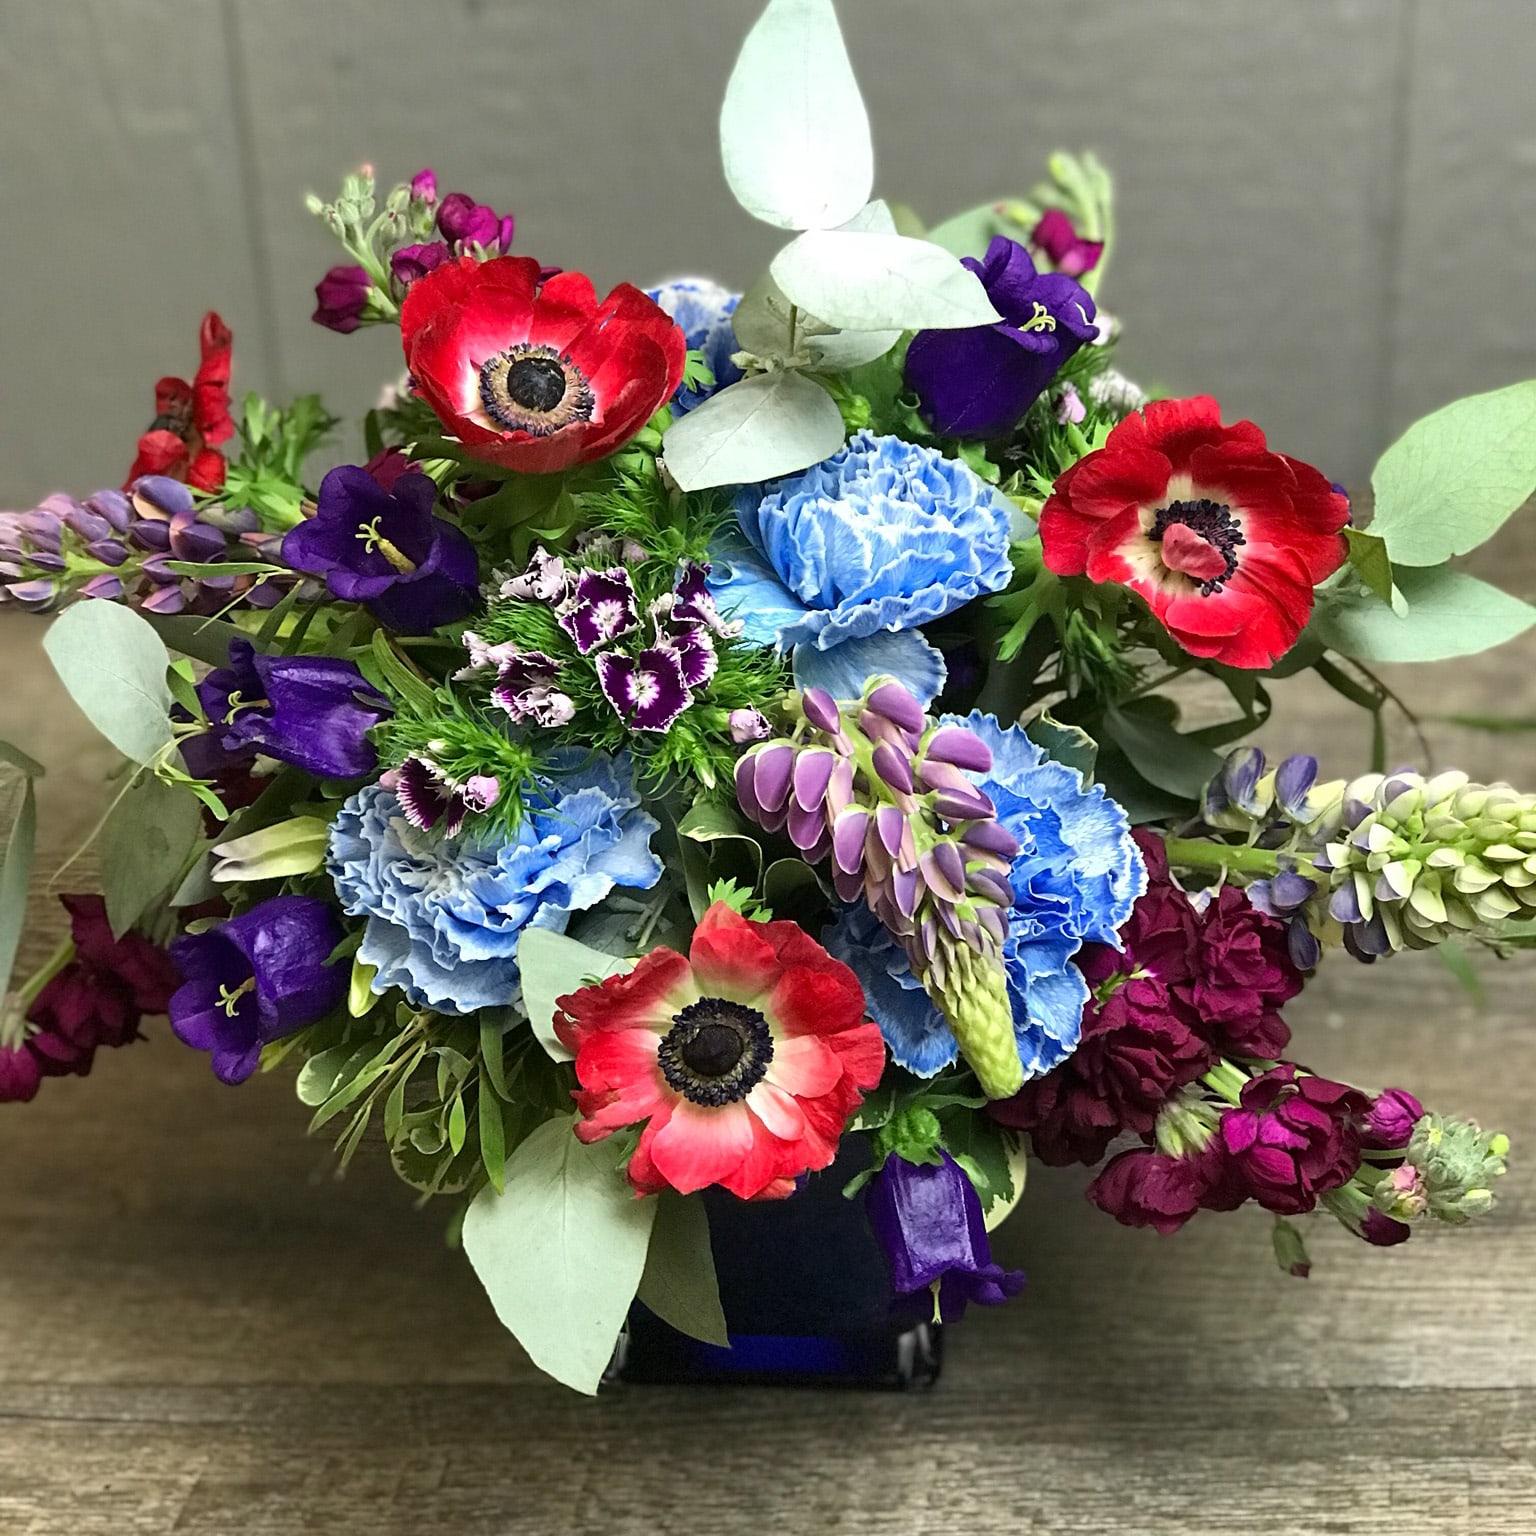 bb7ec05ffeda Red & Blue in Chantilly, VA | Twinbrook Floral Design